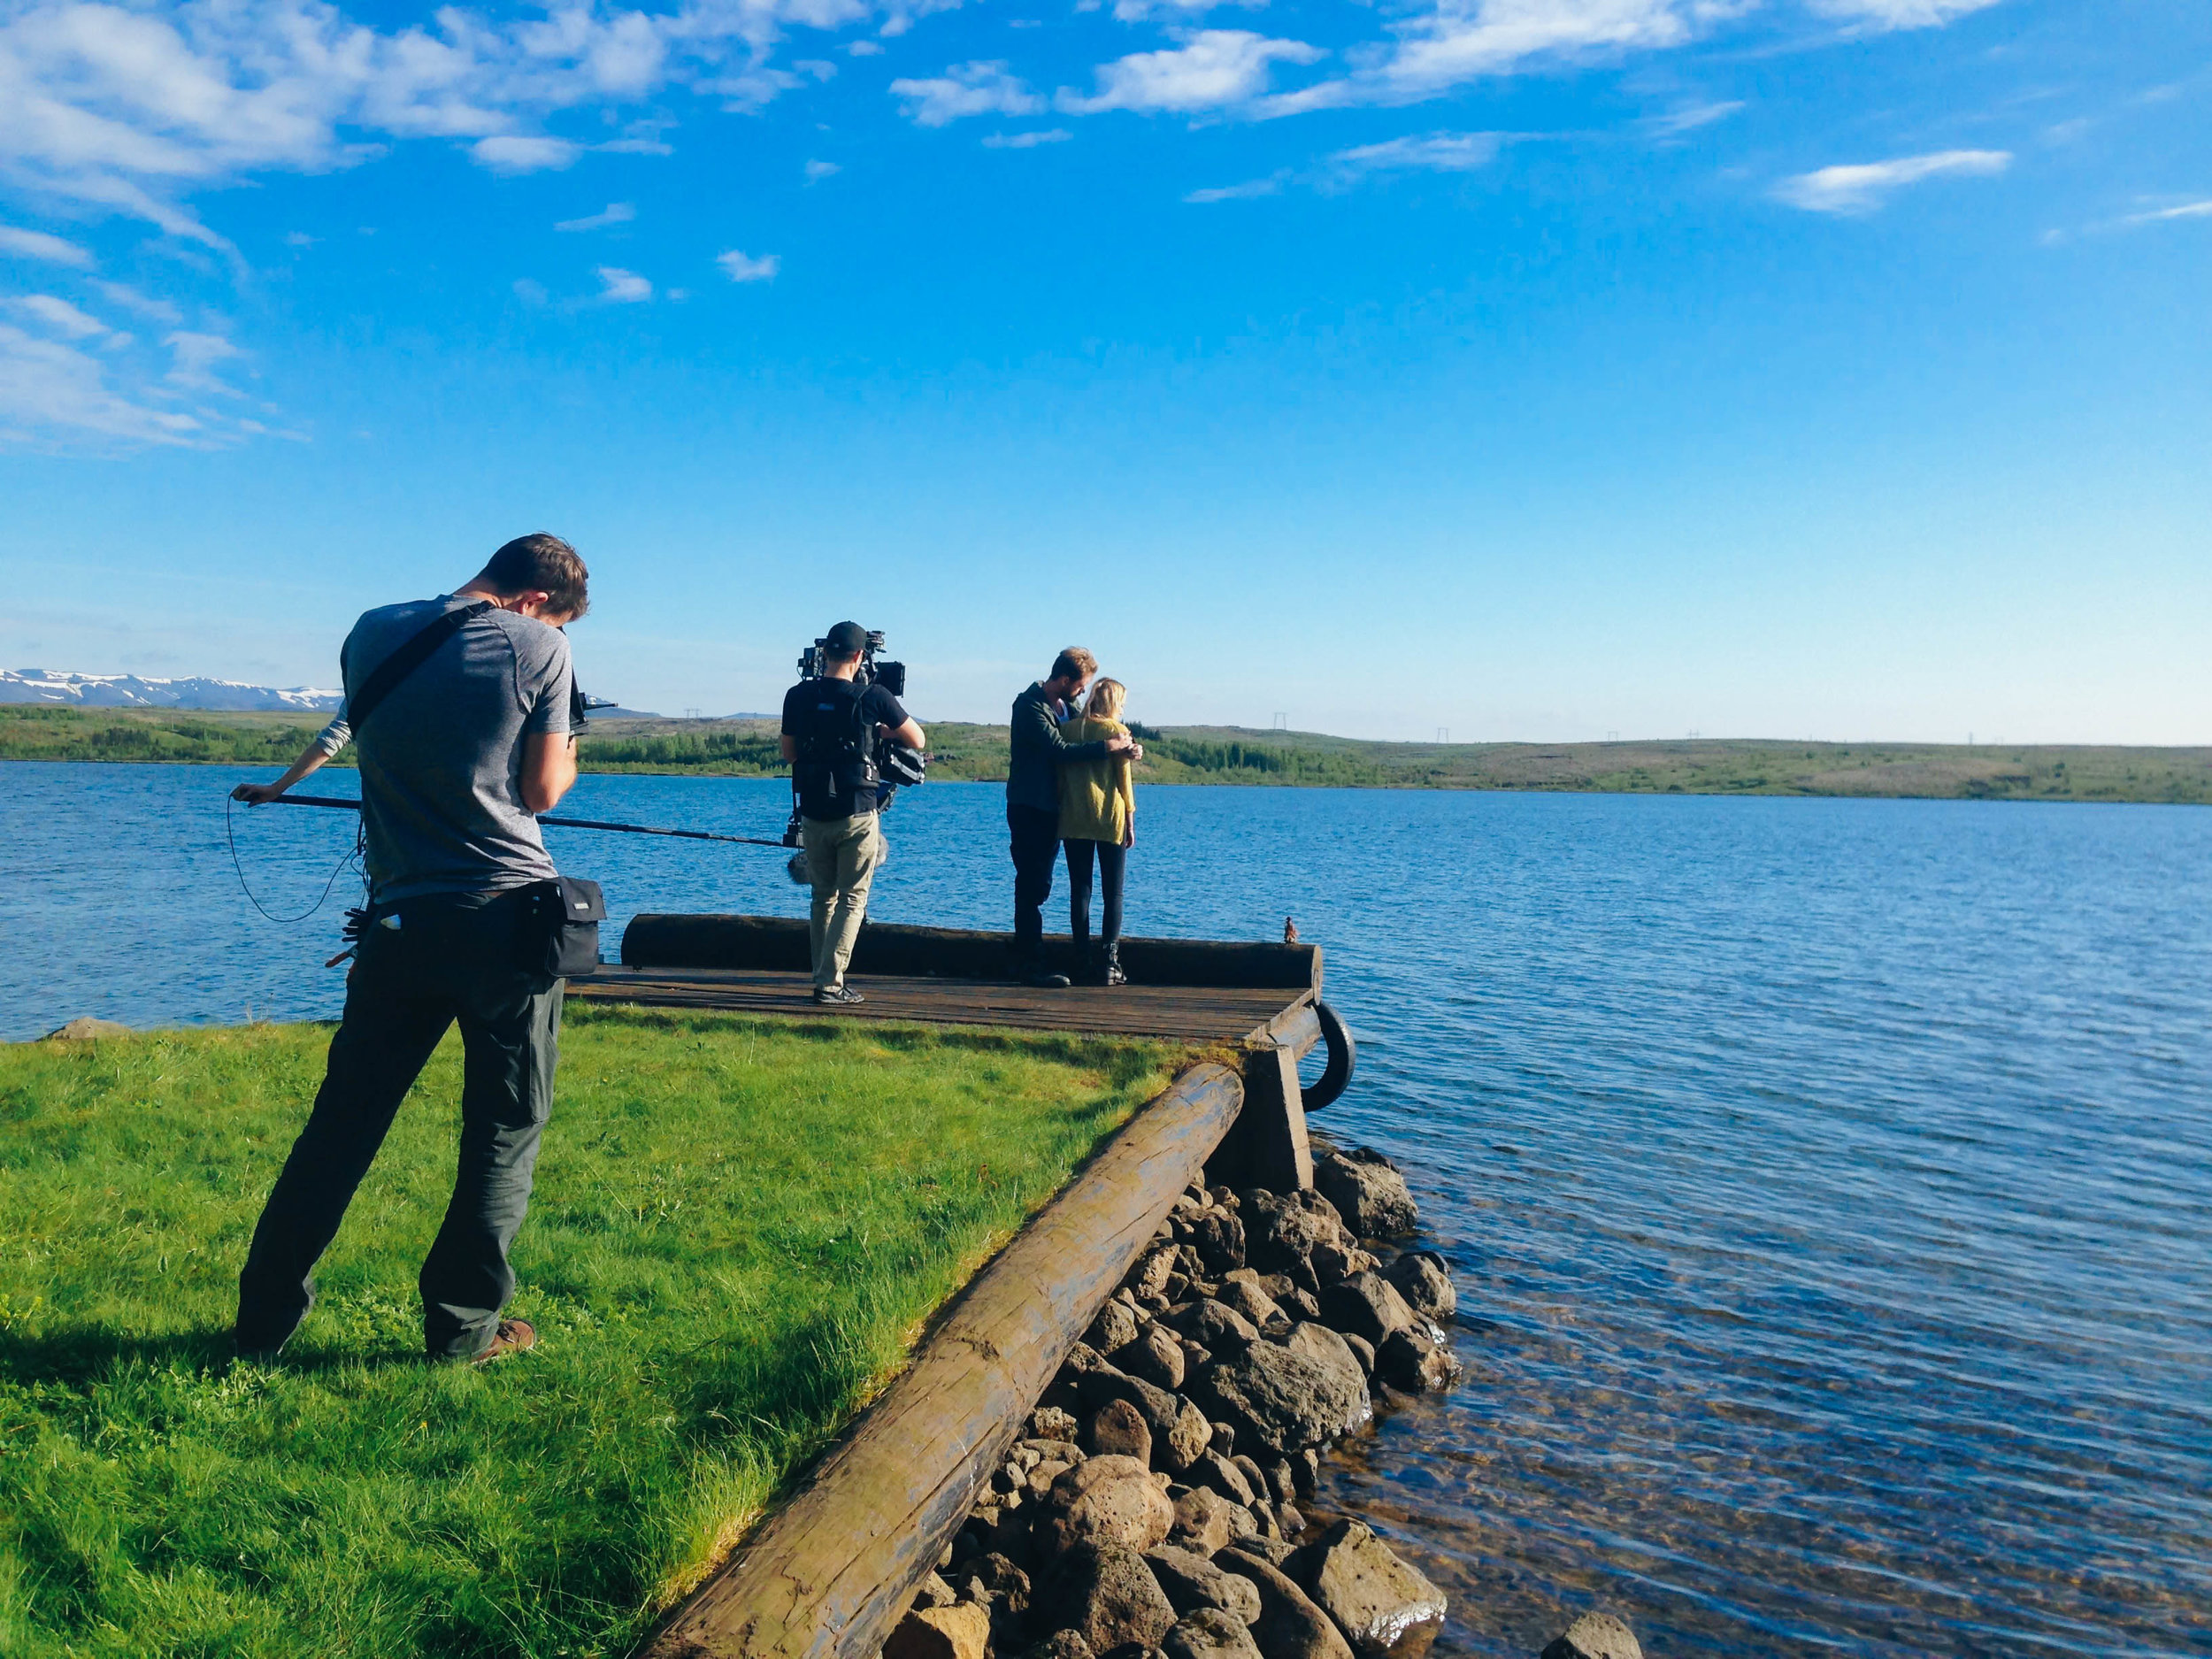 filming a scene just outside of reykjavik